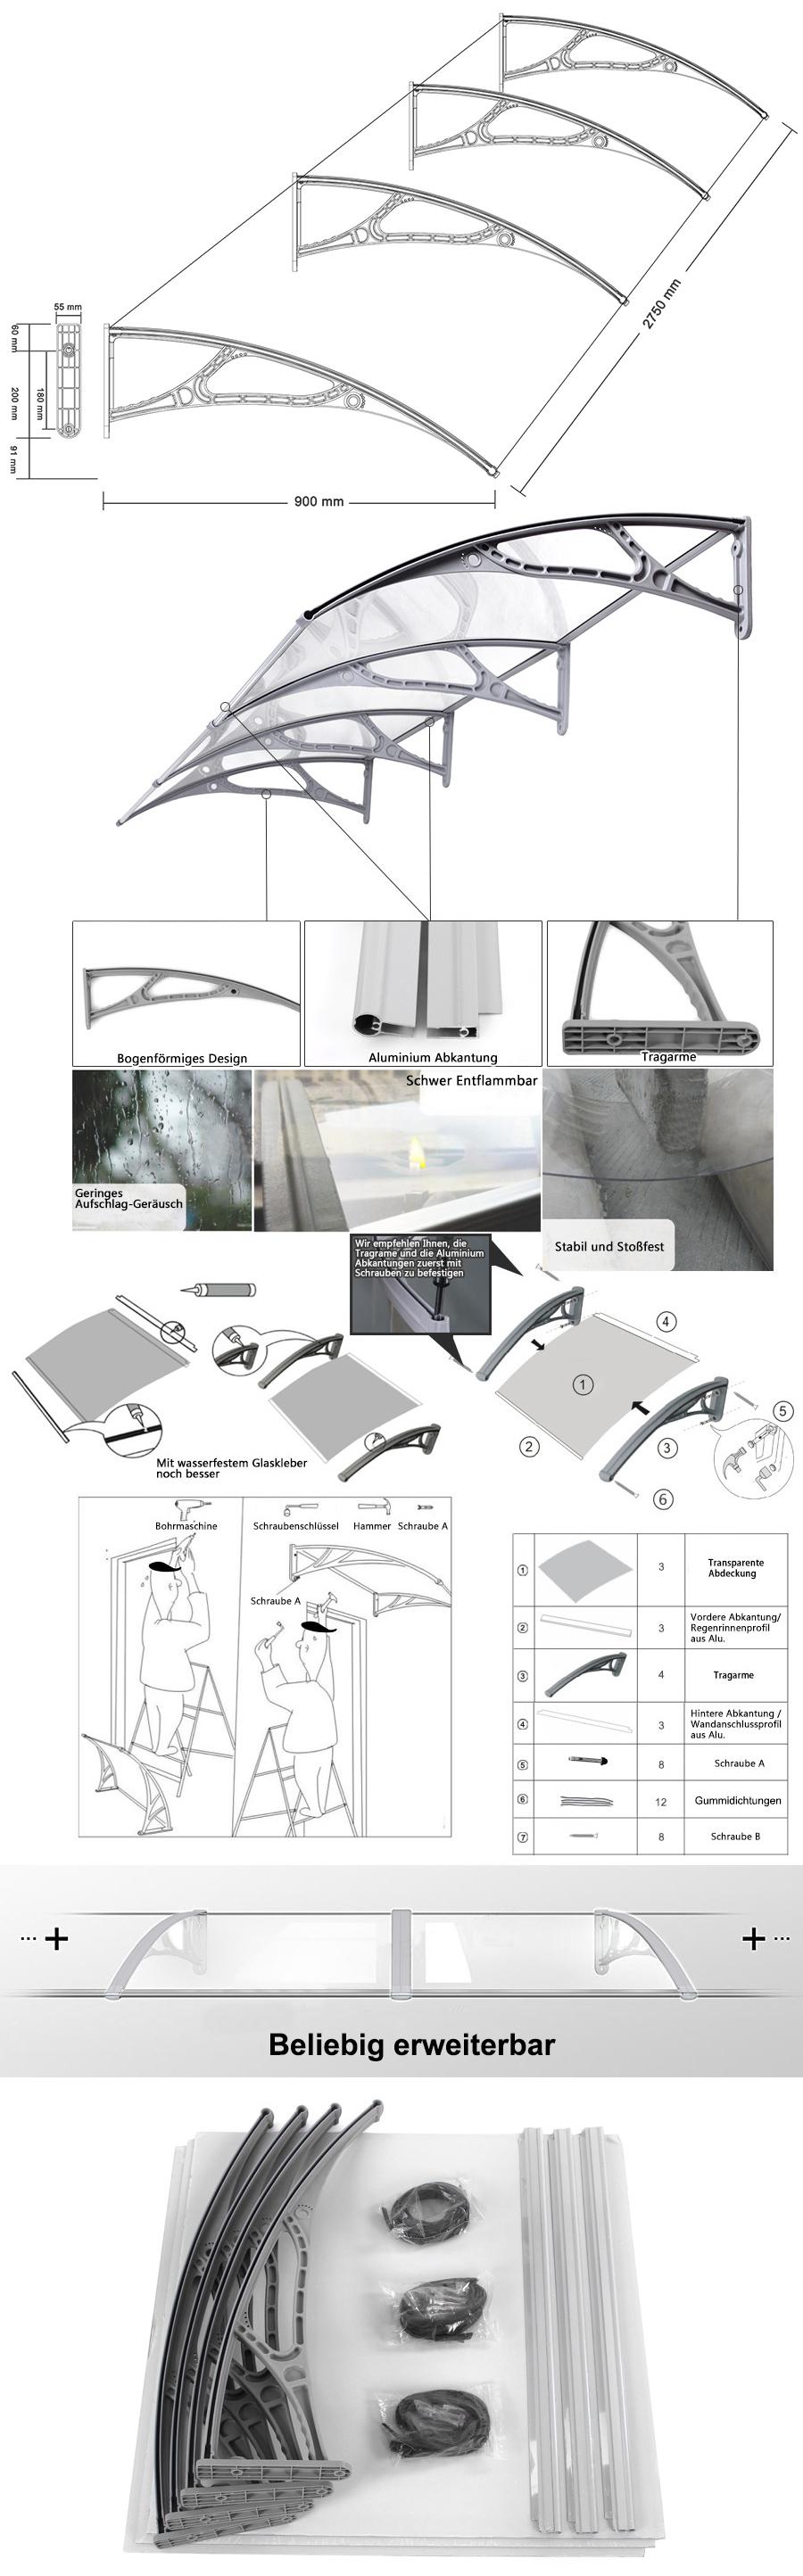 songmics vordach pultvordach t rdach haust rdach alu kunststoff 270x90 cm gvh279 ebay. Black Bedroom Furniture Sets. Home Design Ideas